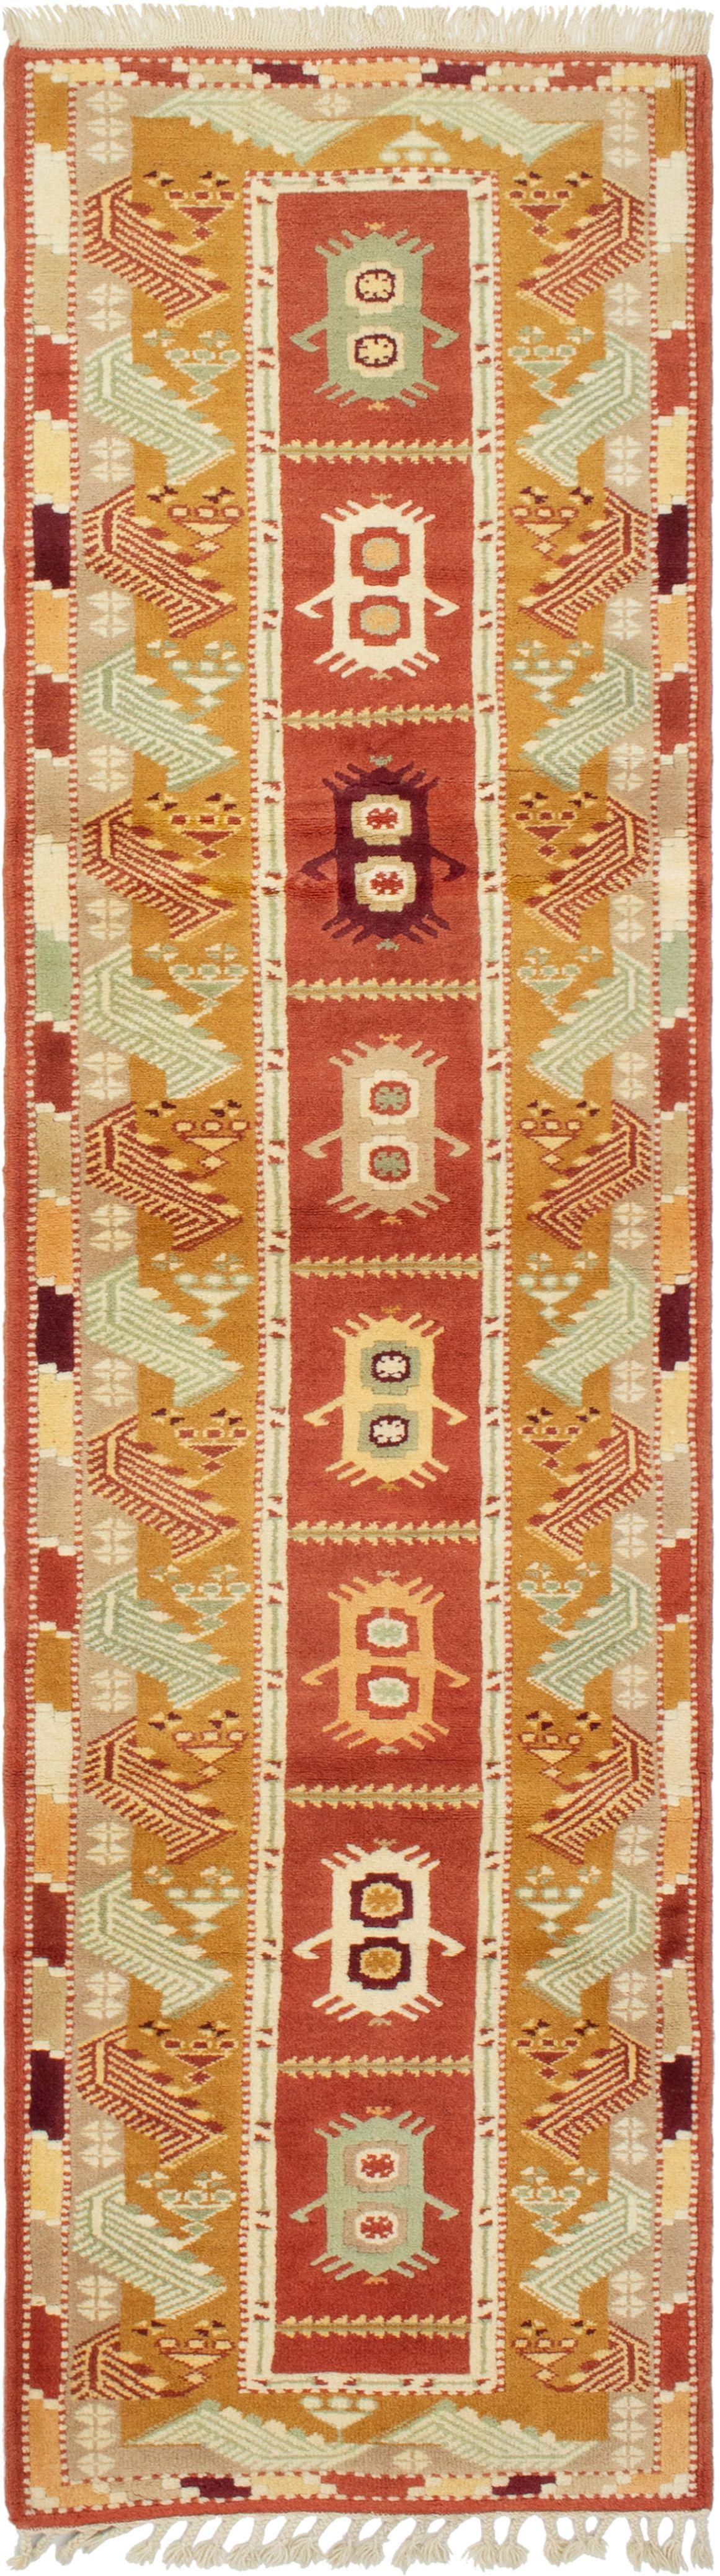 "Hand-knotted Ushak Dark Copper Wool Rug 2'5"" x 9'1"" Size: 2'5"" x 9'1"""